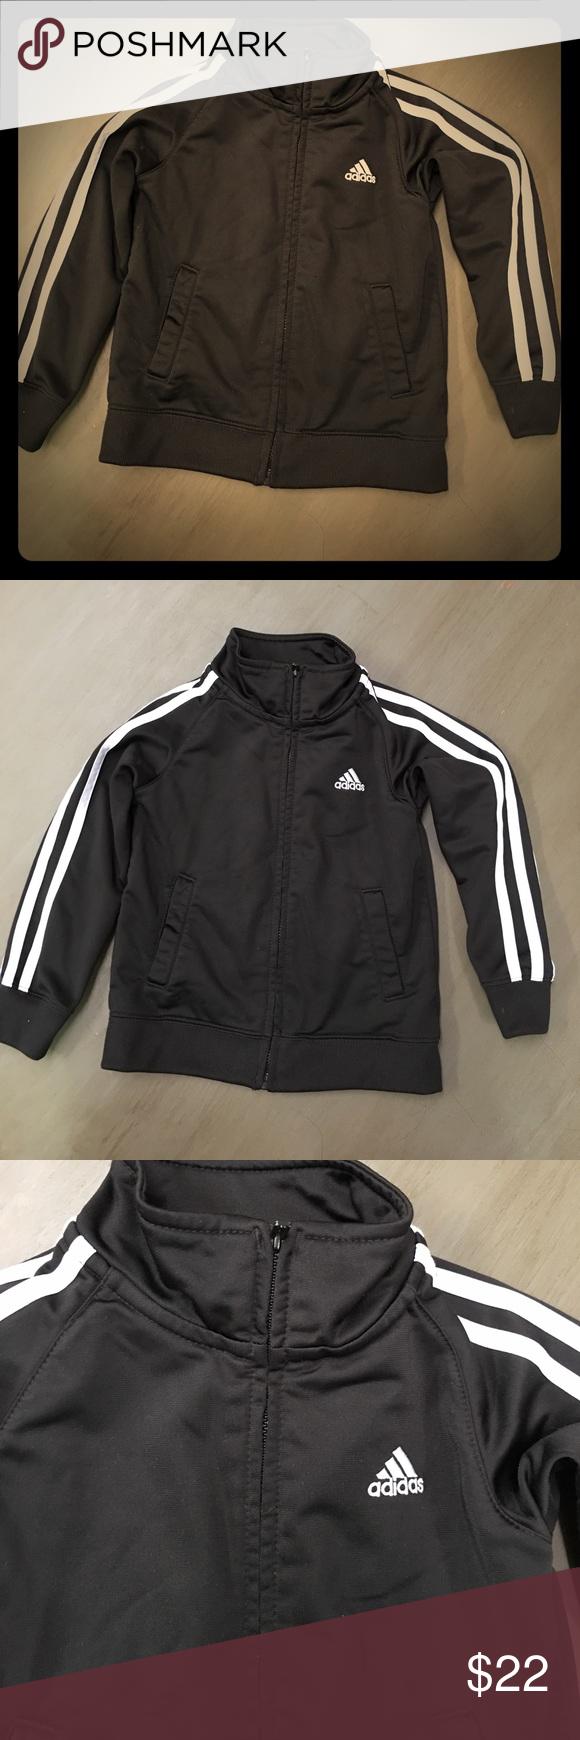 Adidas black and white 3t zip up jacket Adidas black and white 3t zip up jacket Jackets & Coats